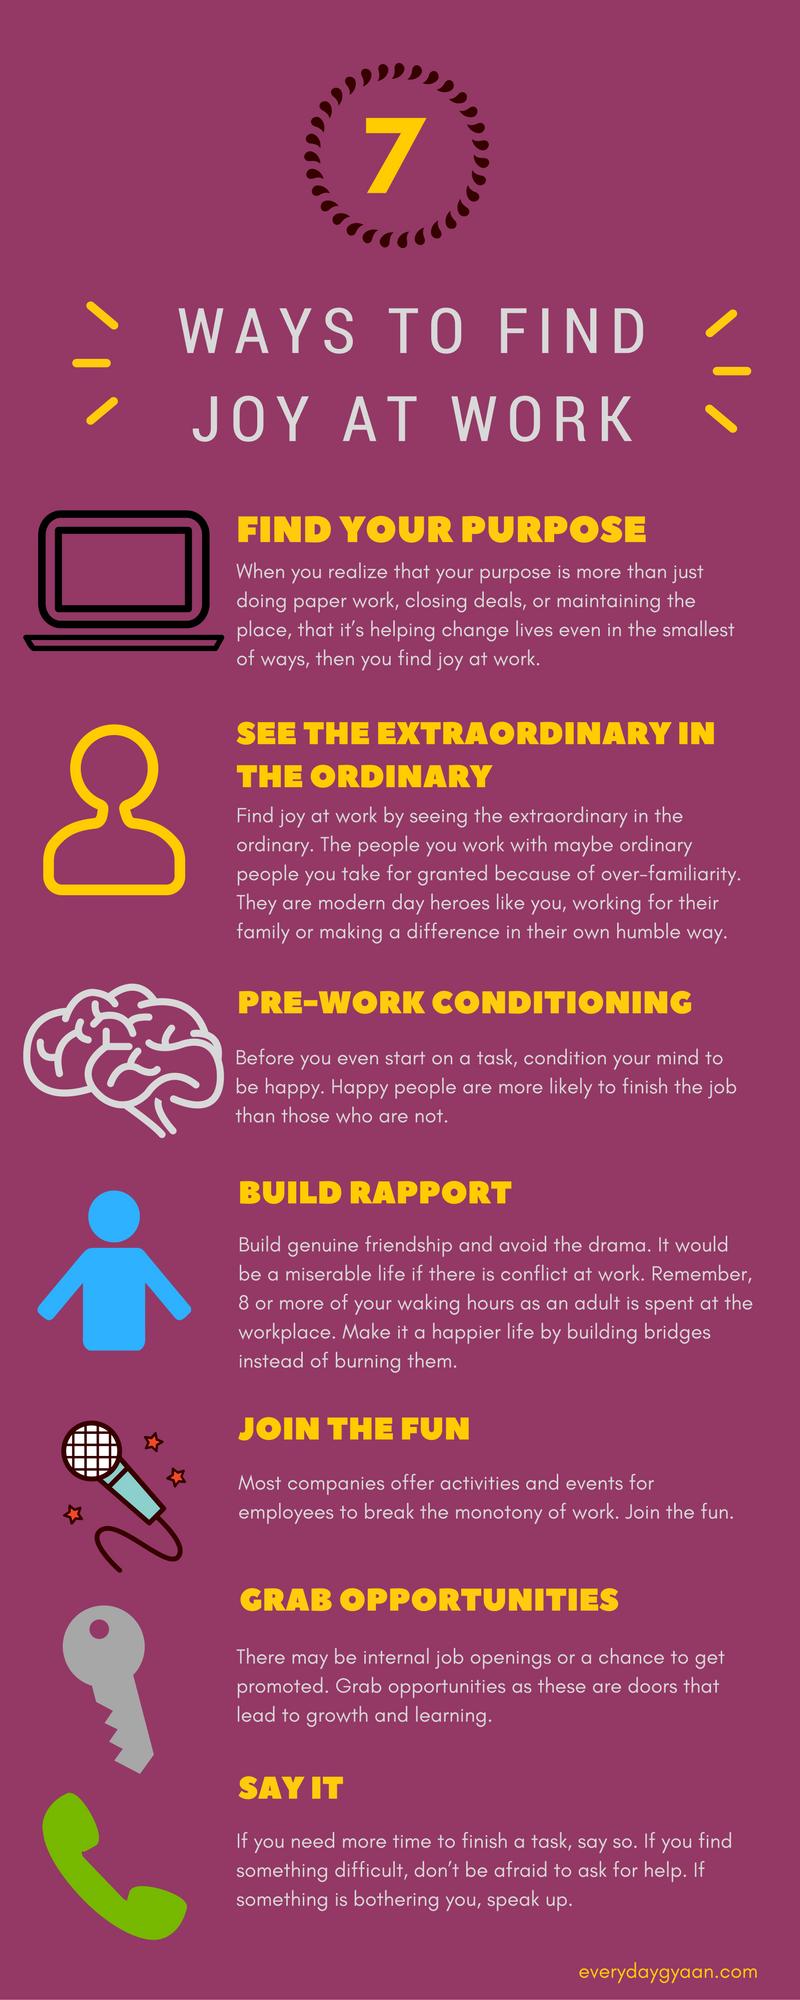 7-ways-to-find-joy-at-work-infographic